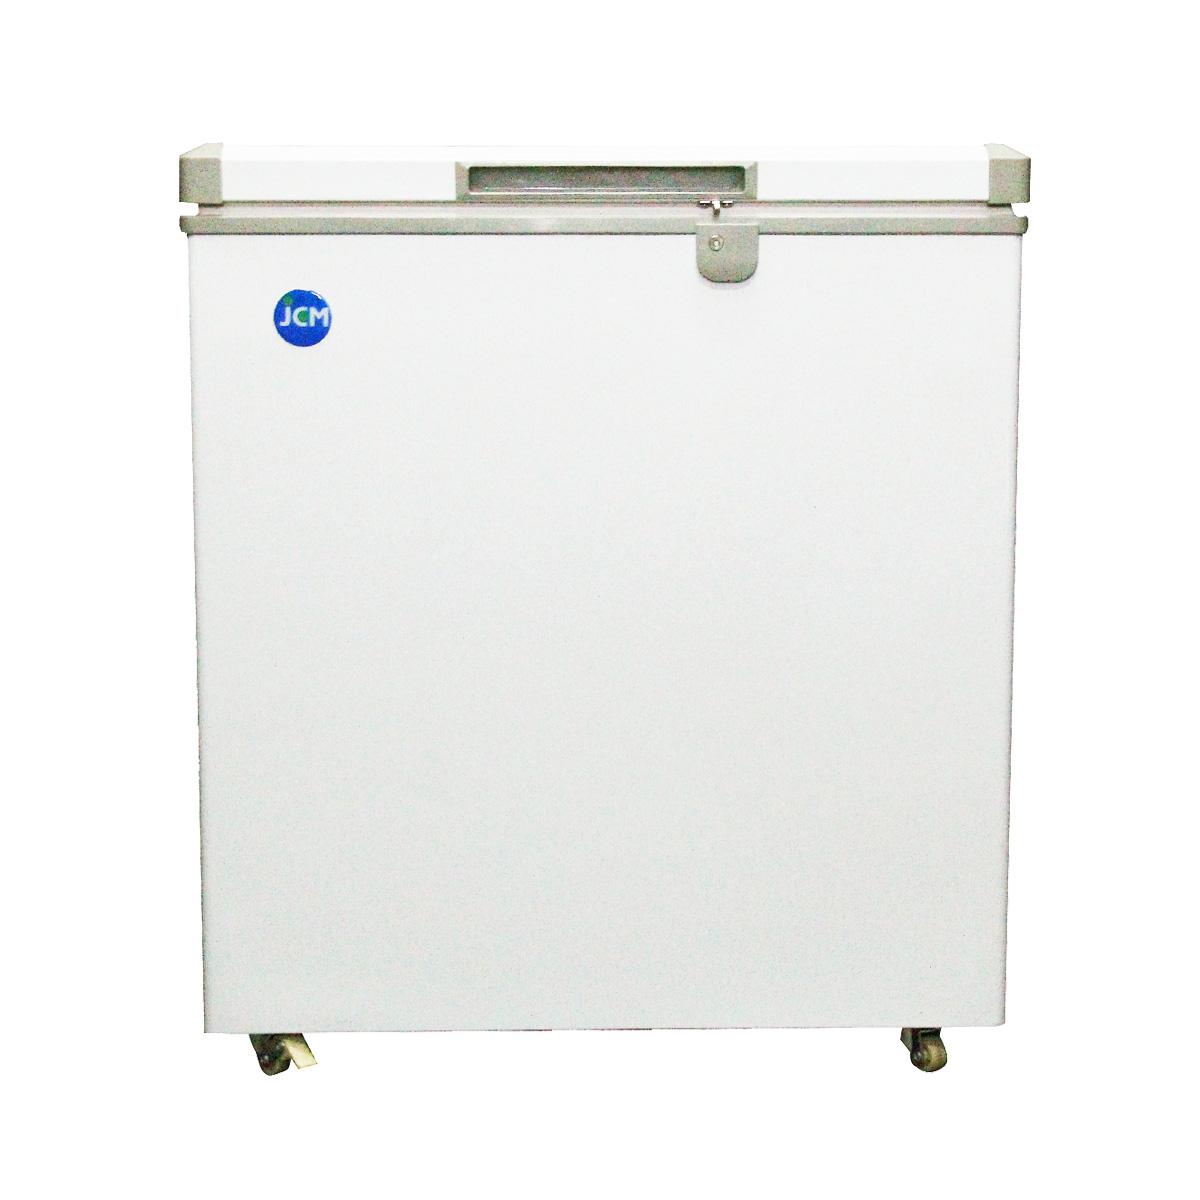 JCM 冷凍ストッカー 142L JCMC-142 業務用 冷凍庫 ストッカー 保冷庫 【代引不可】